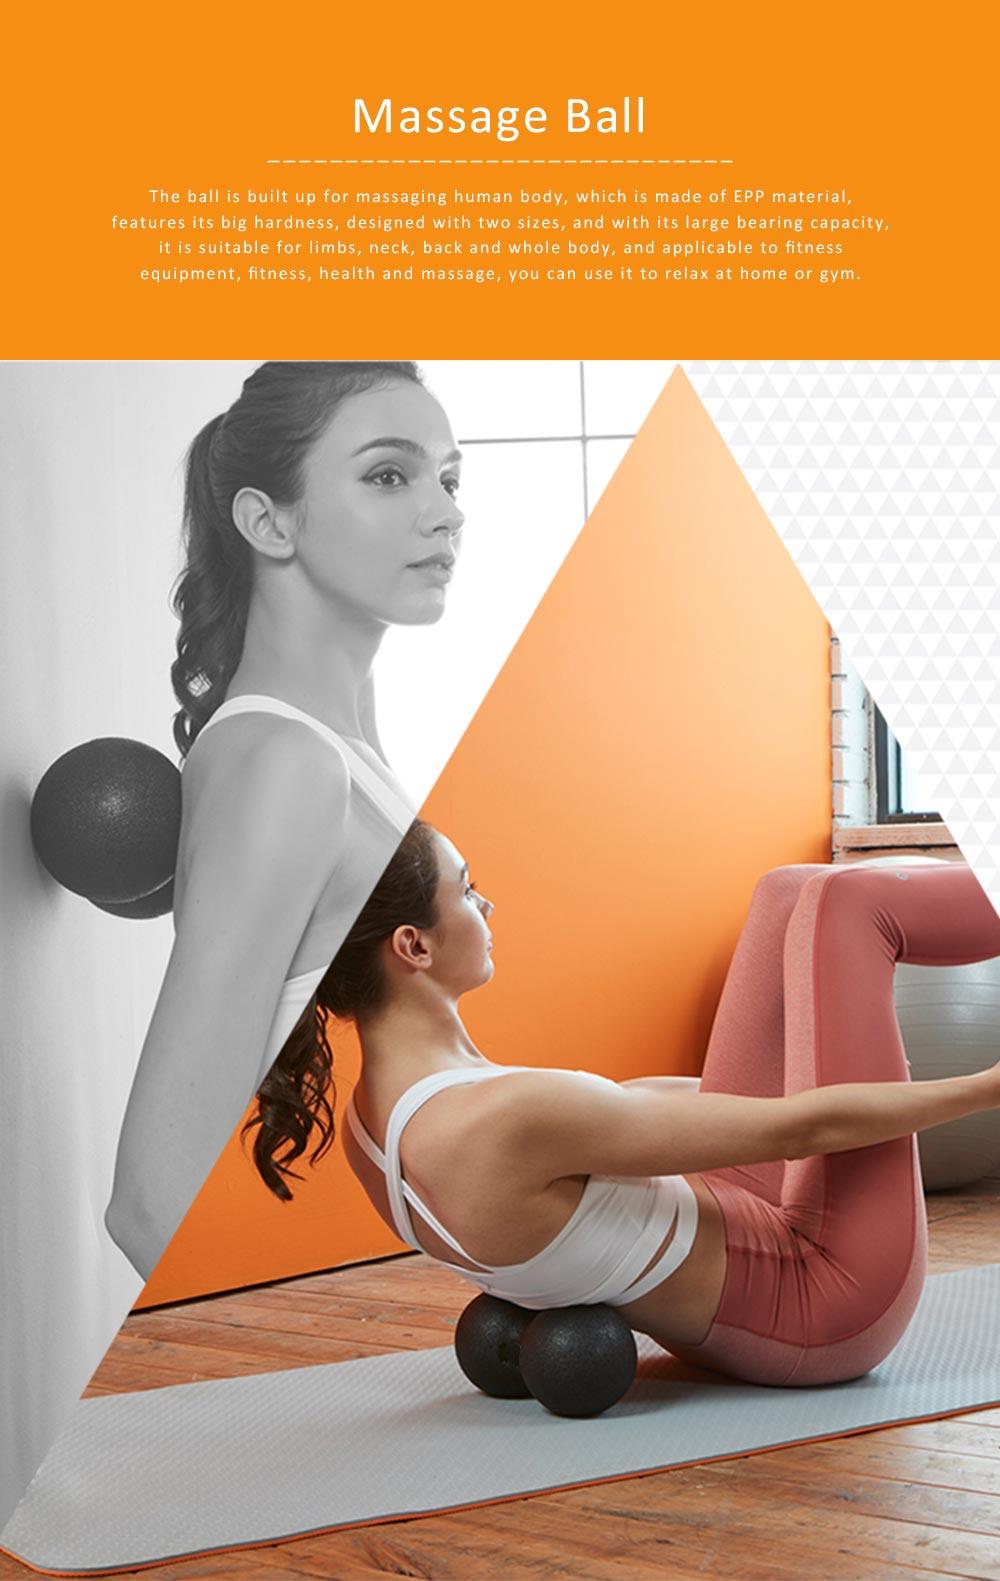 Massage Ball Peanut Shape EPP Material for Relaxing Training Body Mini Yoga Ball 0